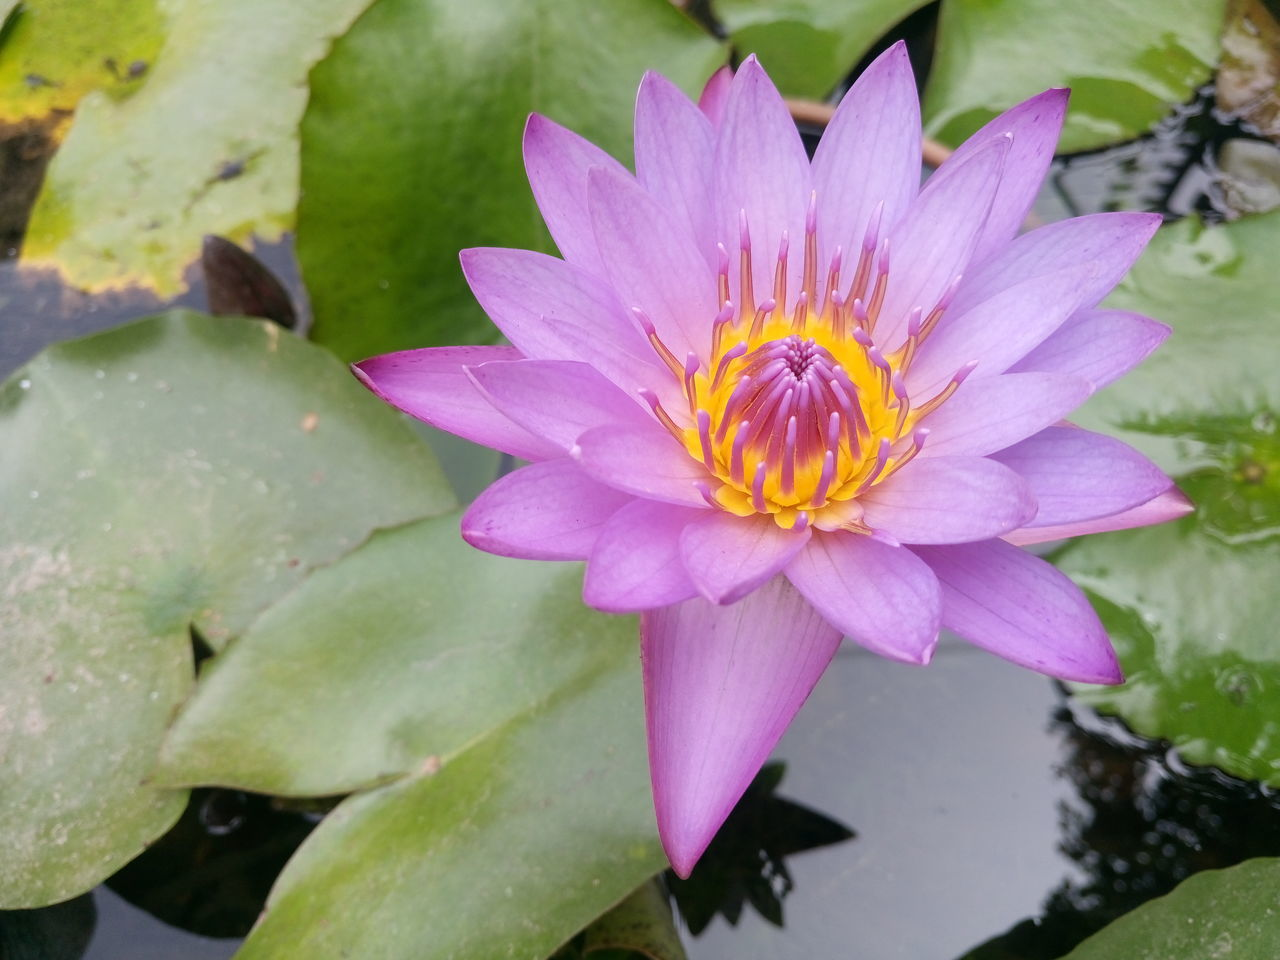 Lotus Flower Floralphotography Floral #flower Indian School Of Business EyeEm Best Shots Sony Xperia M5 Sony Xperia Photography. EyeEm Nature Lover Flowers Garden Photography Eyeem Mornings Greenery Natures Beauty